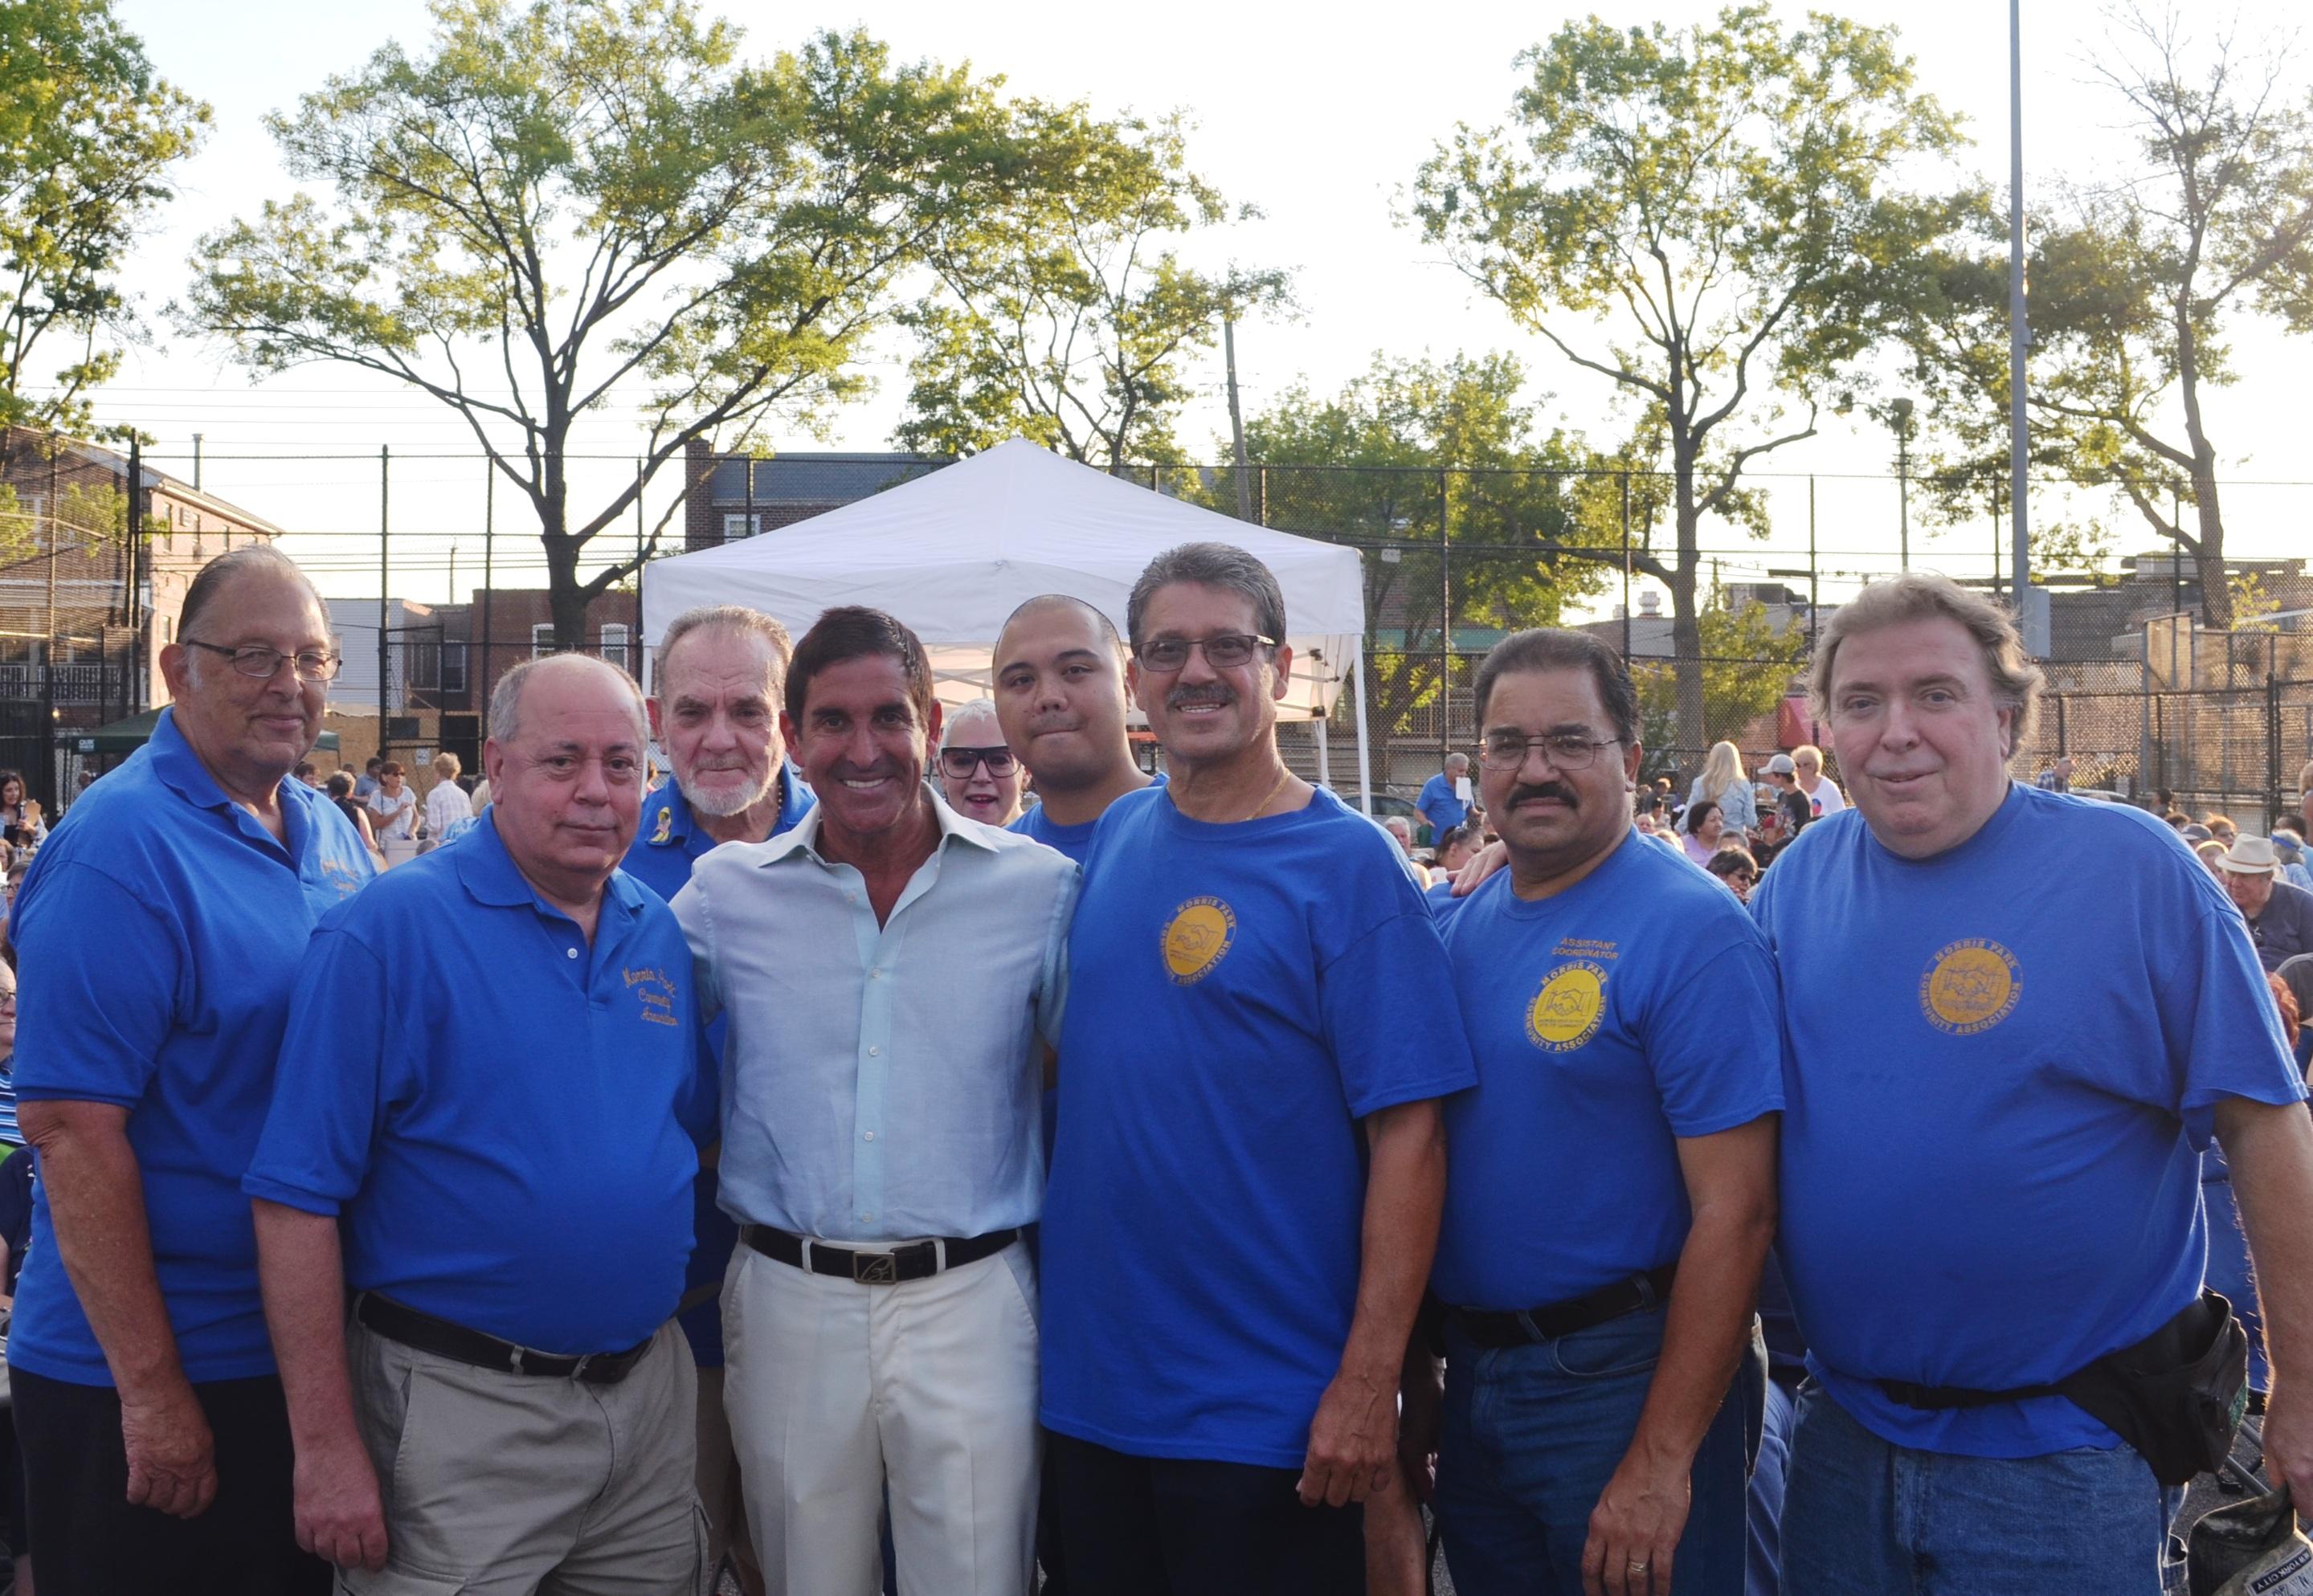 Senator Klein and MPCA at Chubby Checker Concert - Aug. 2015